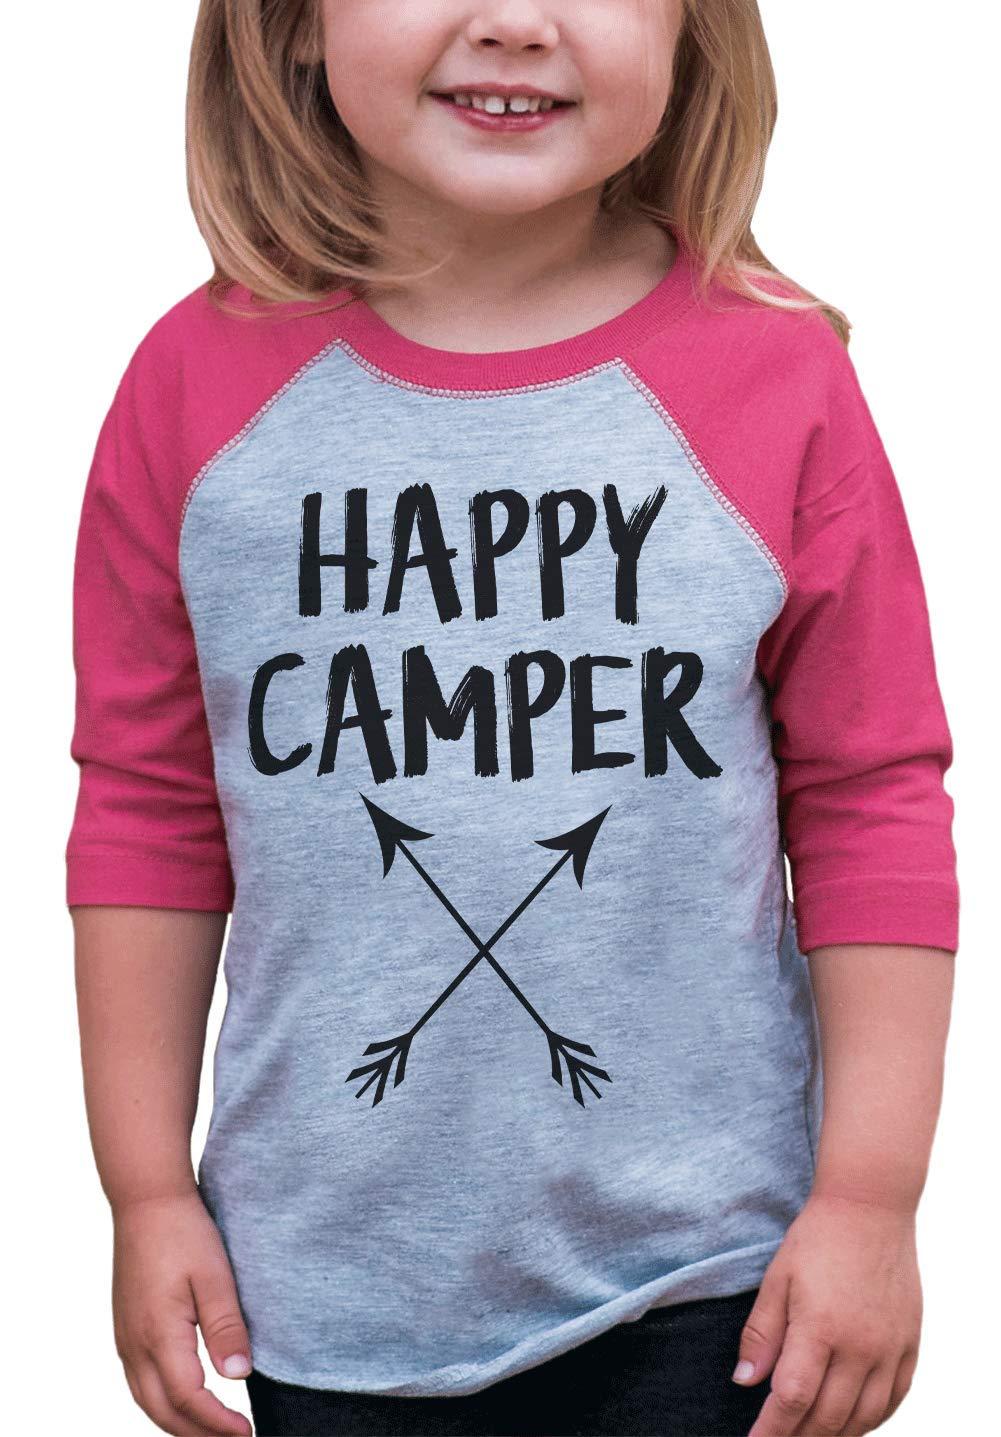 7 ate 9 Apparel Girl's Happy Camper Outdoors Raglan Tee